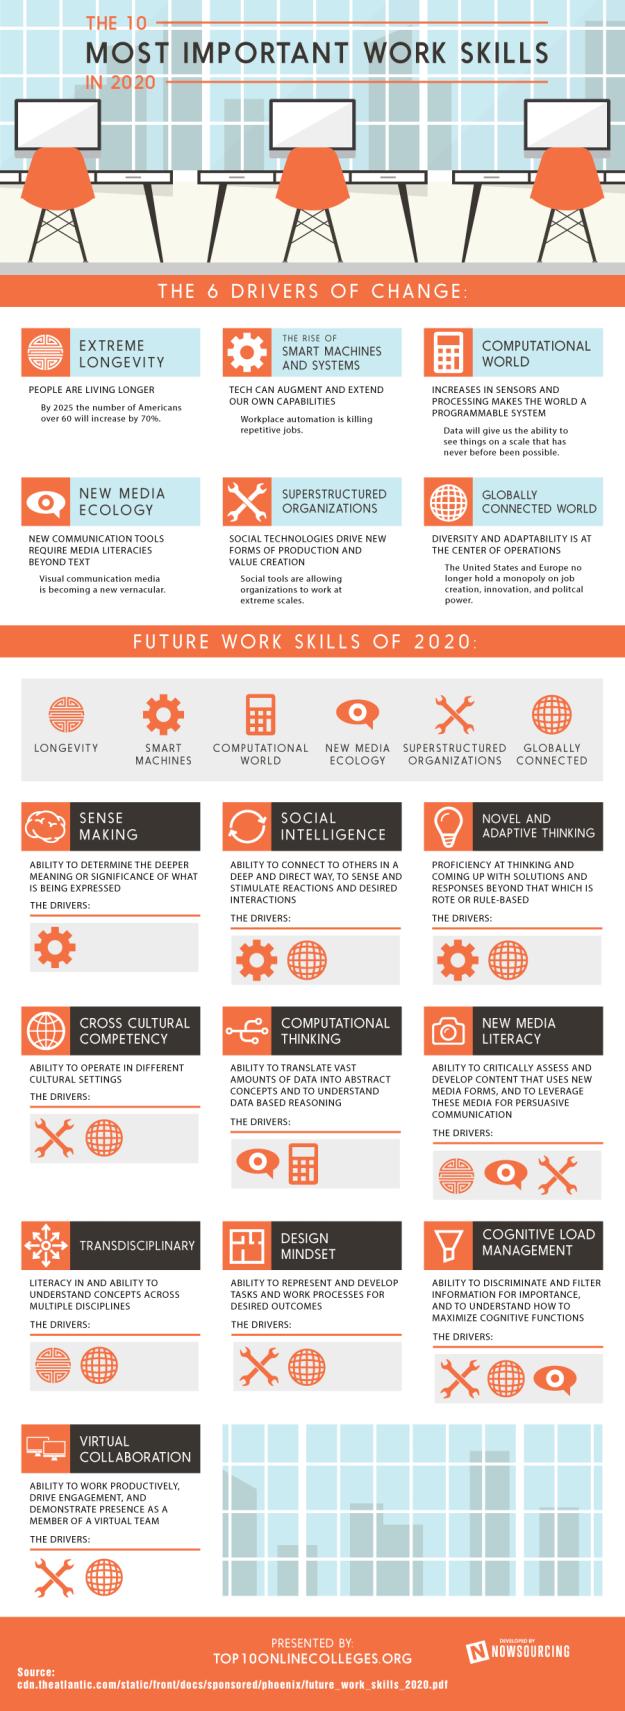 Work-2020-skills